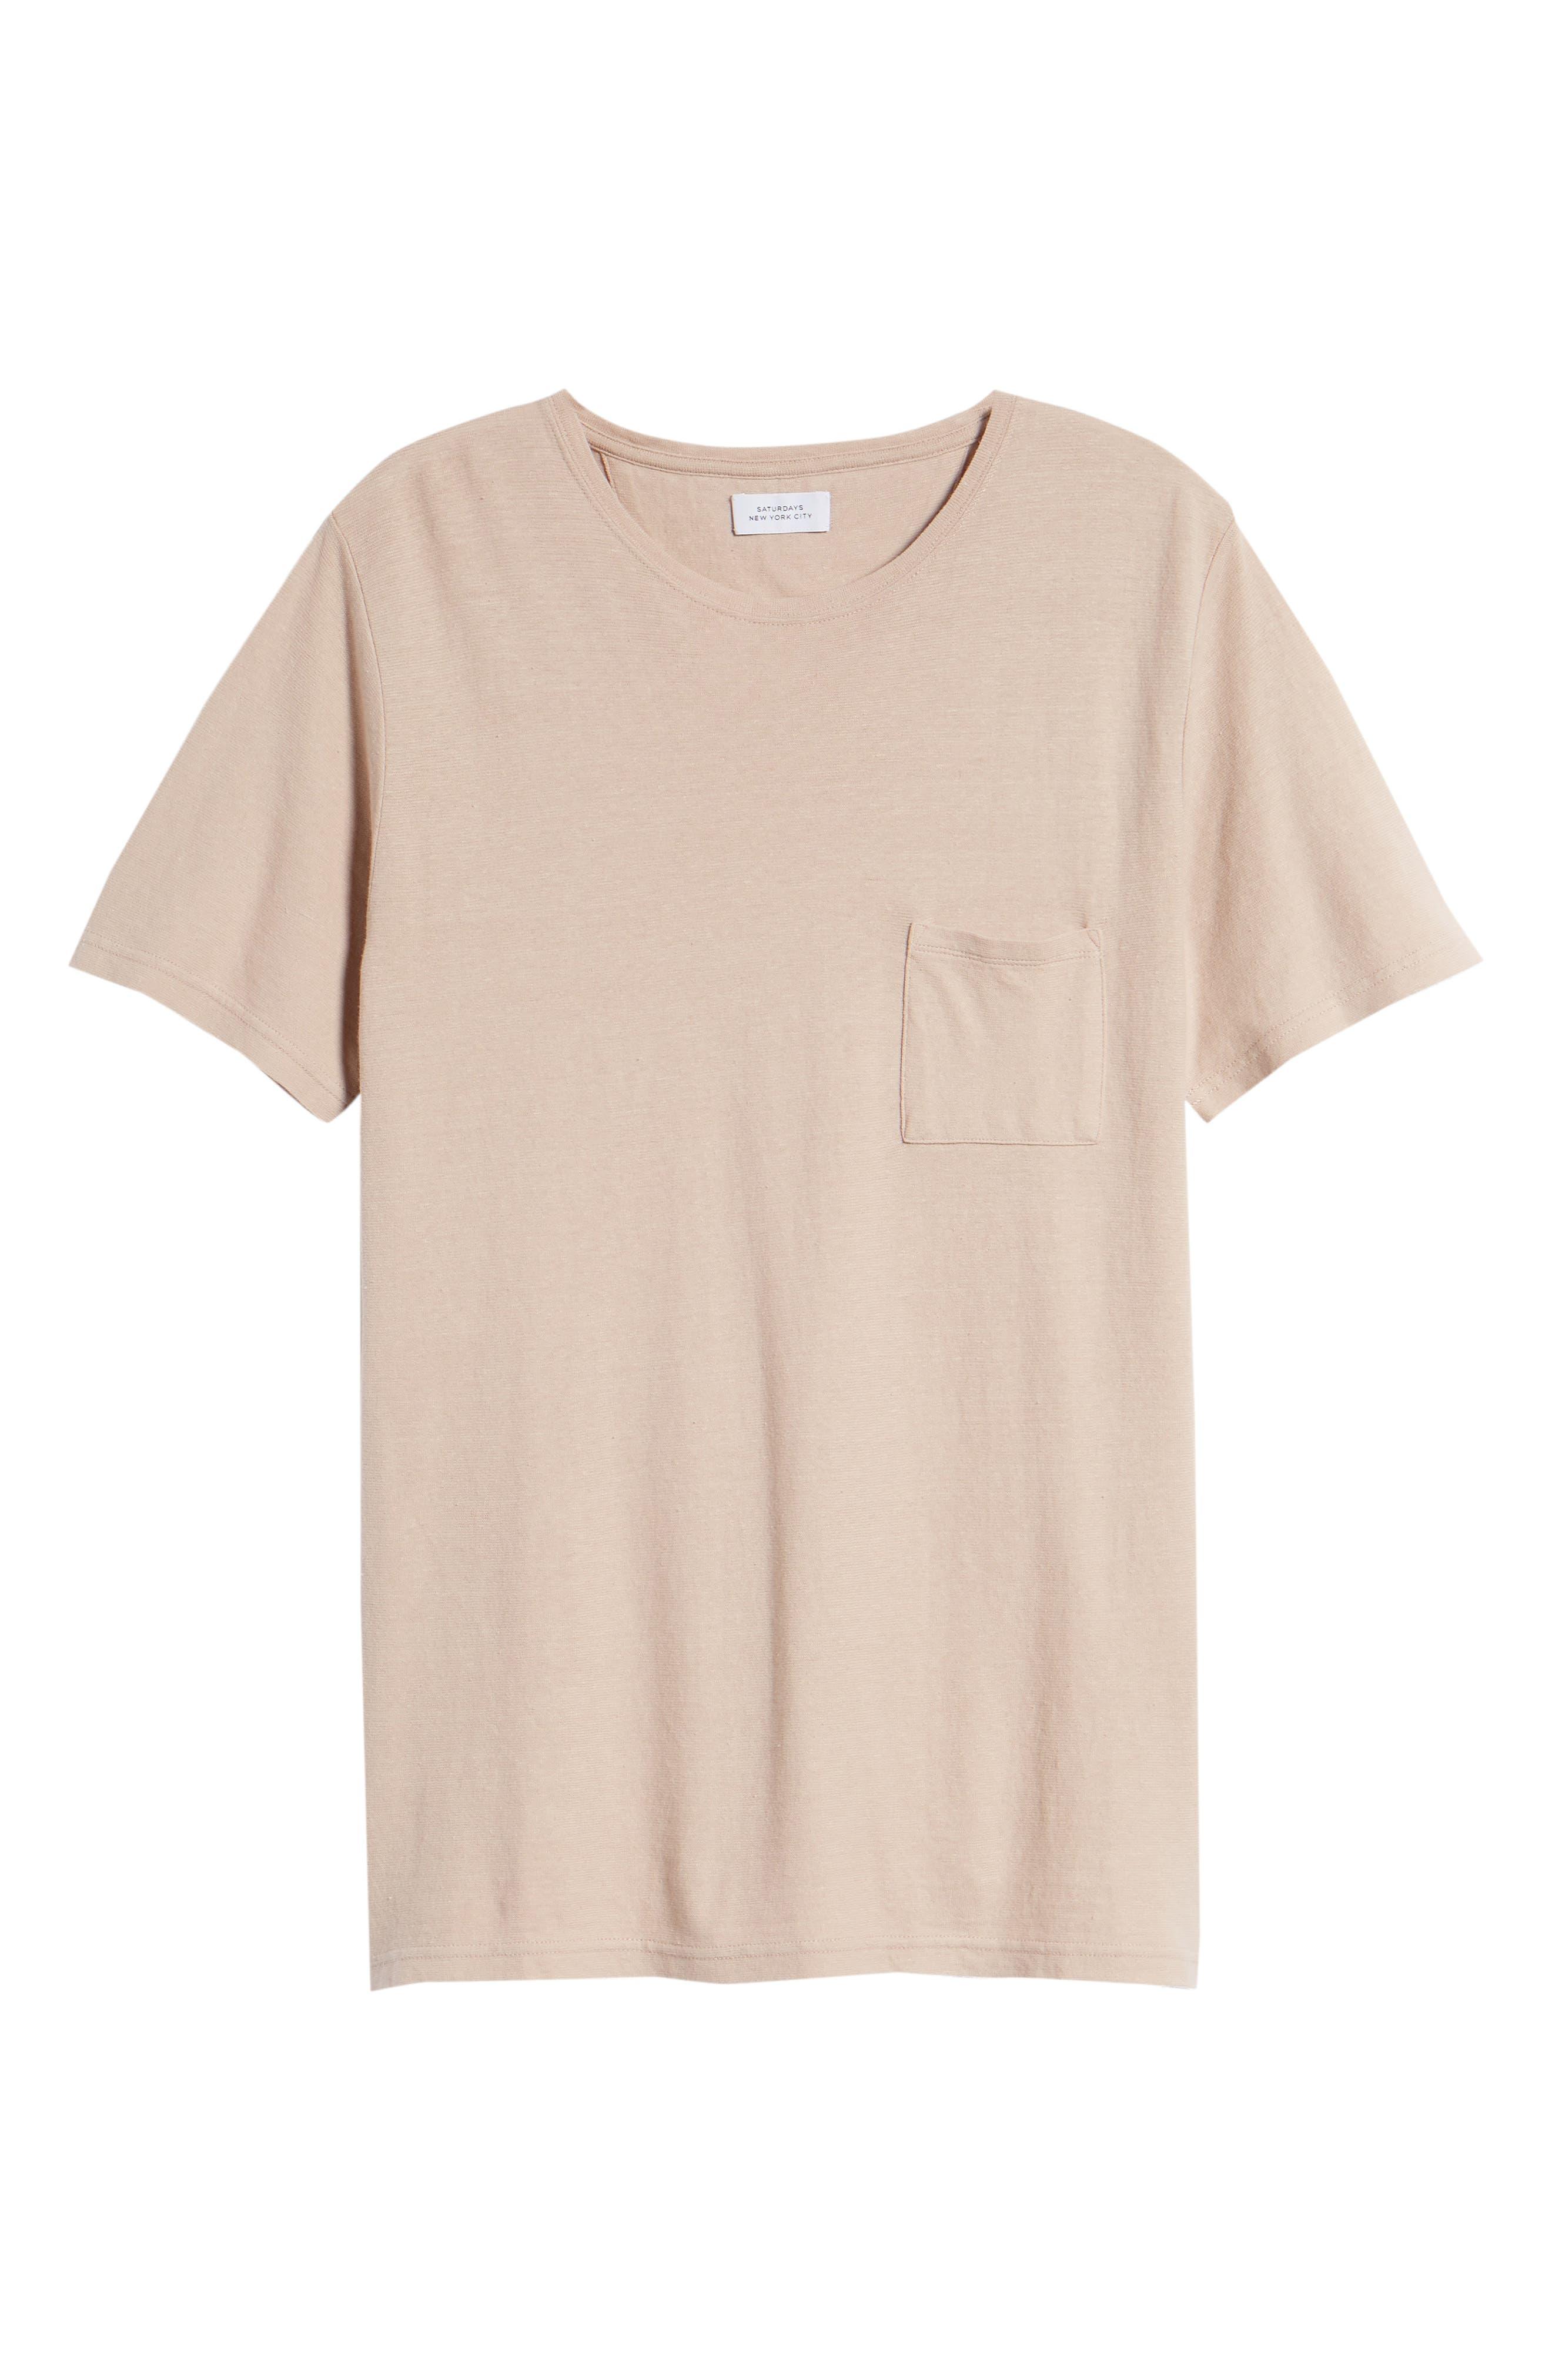 Collett Gauze T-Shirt,                             Alternate thumbnail 6, color,                             250